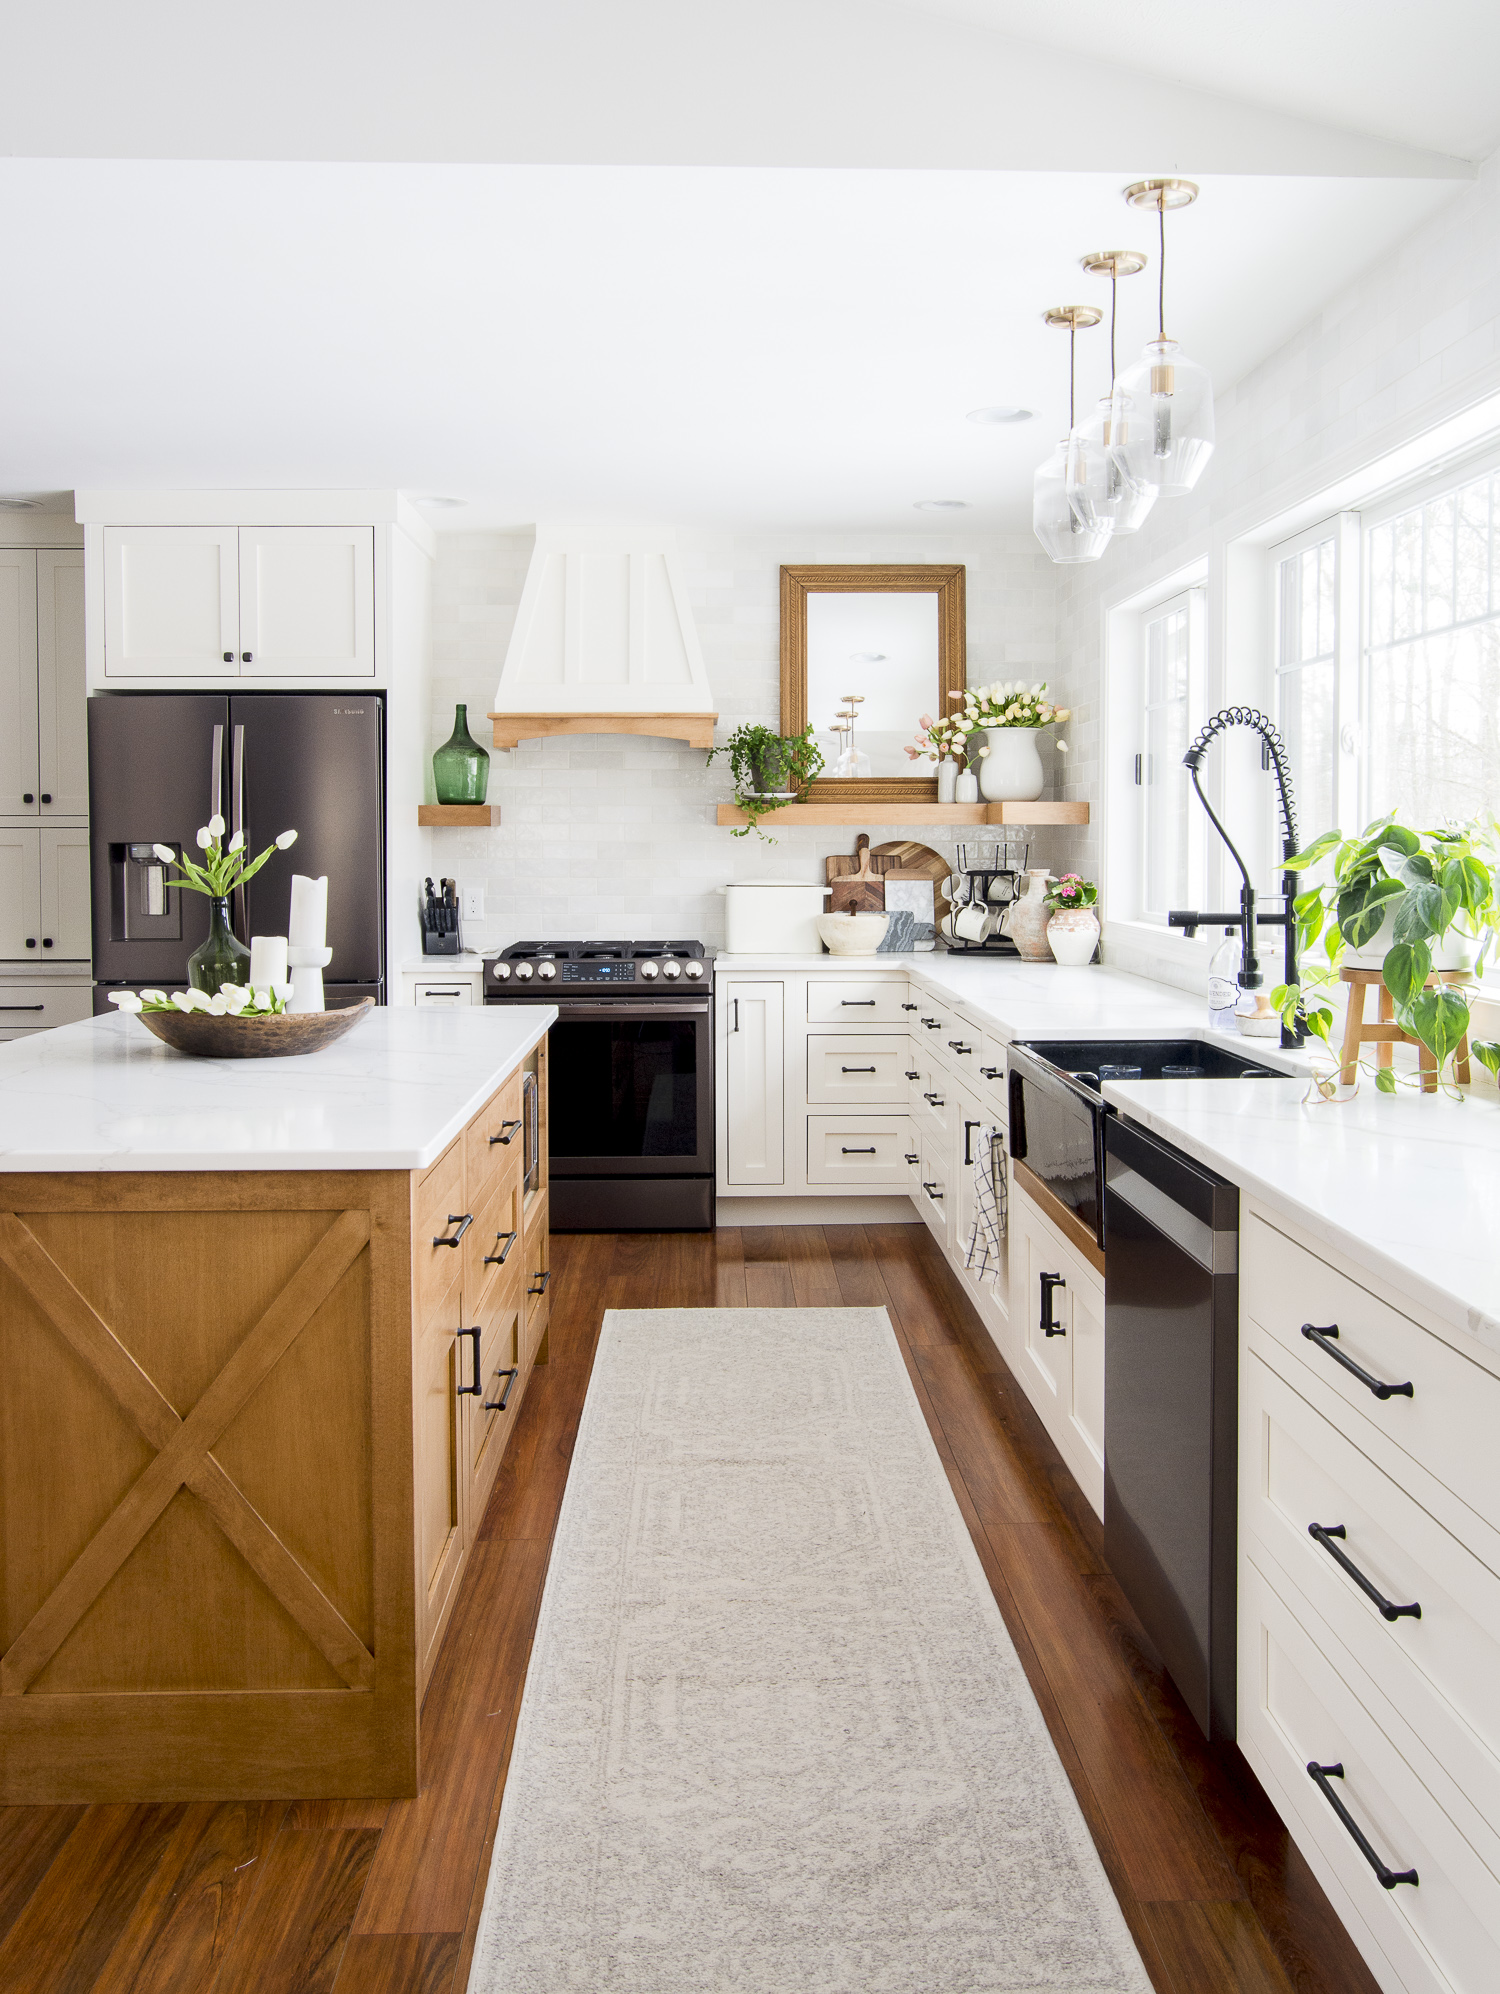 Spring kitchen decor ideas.